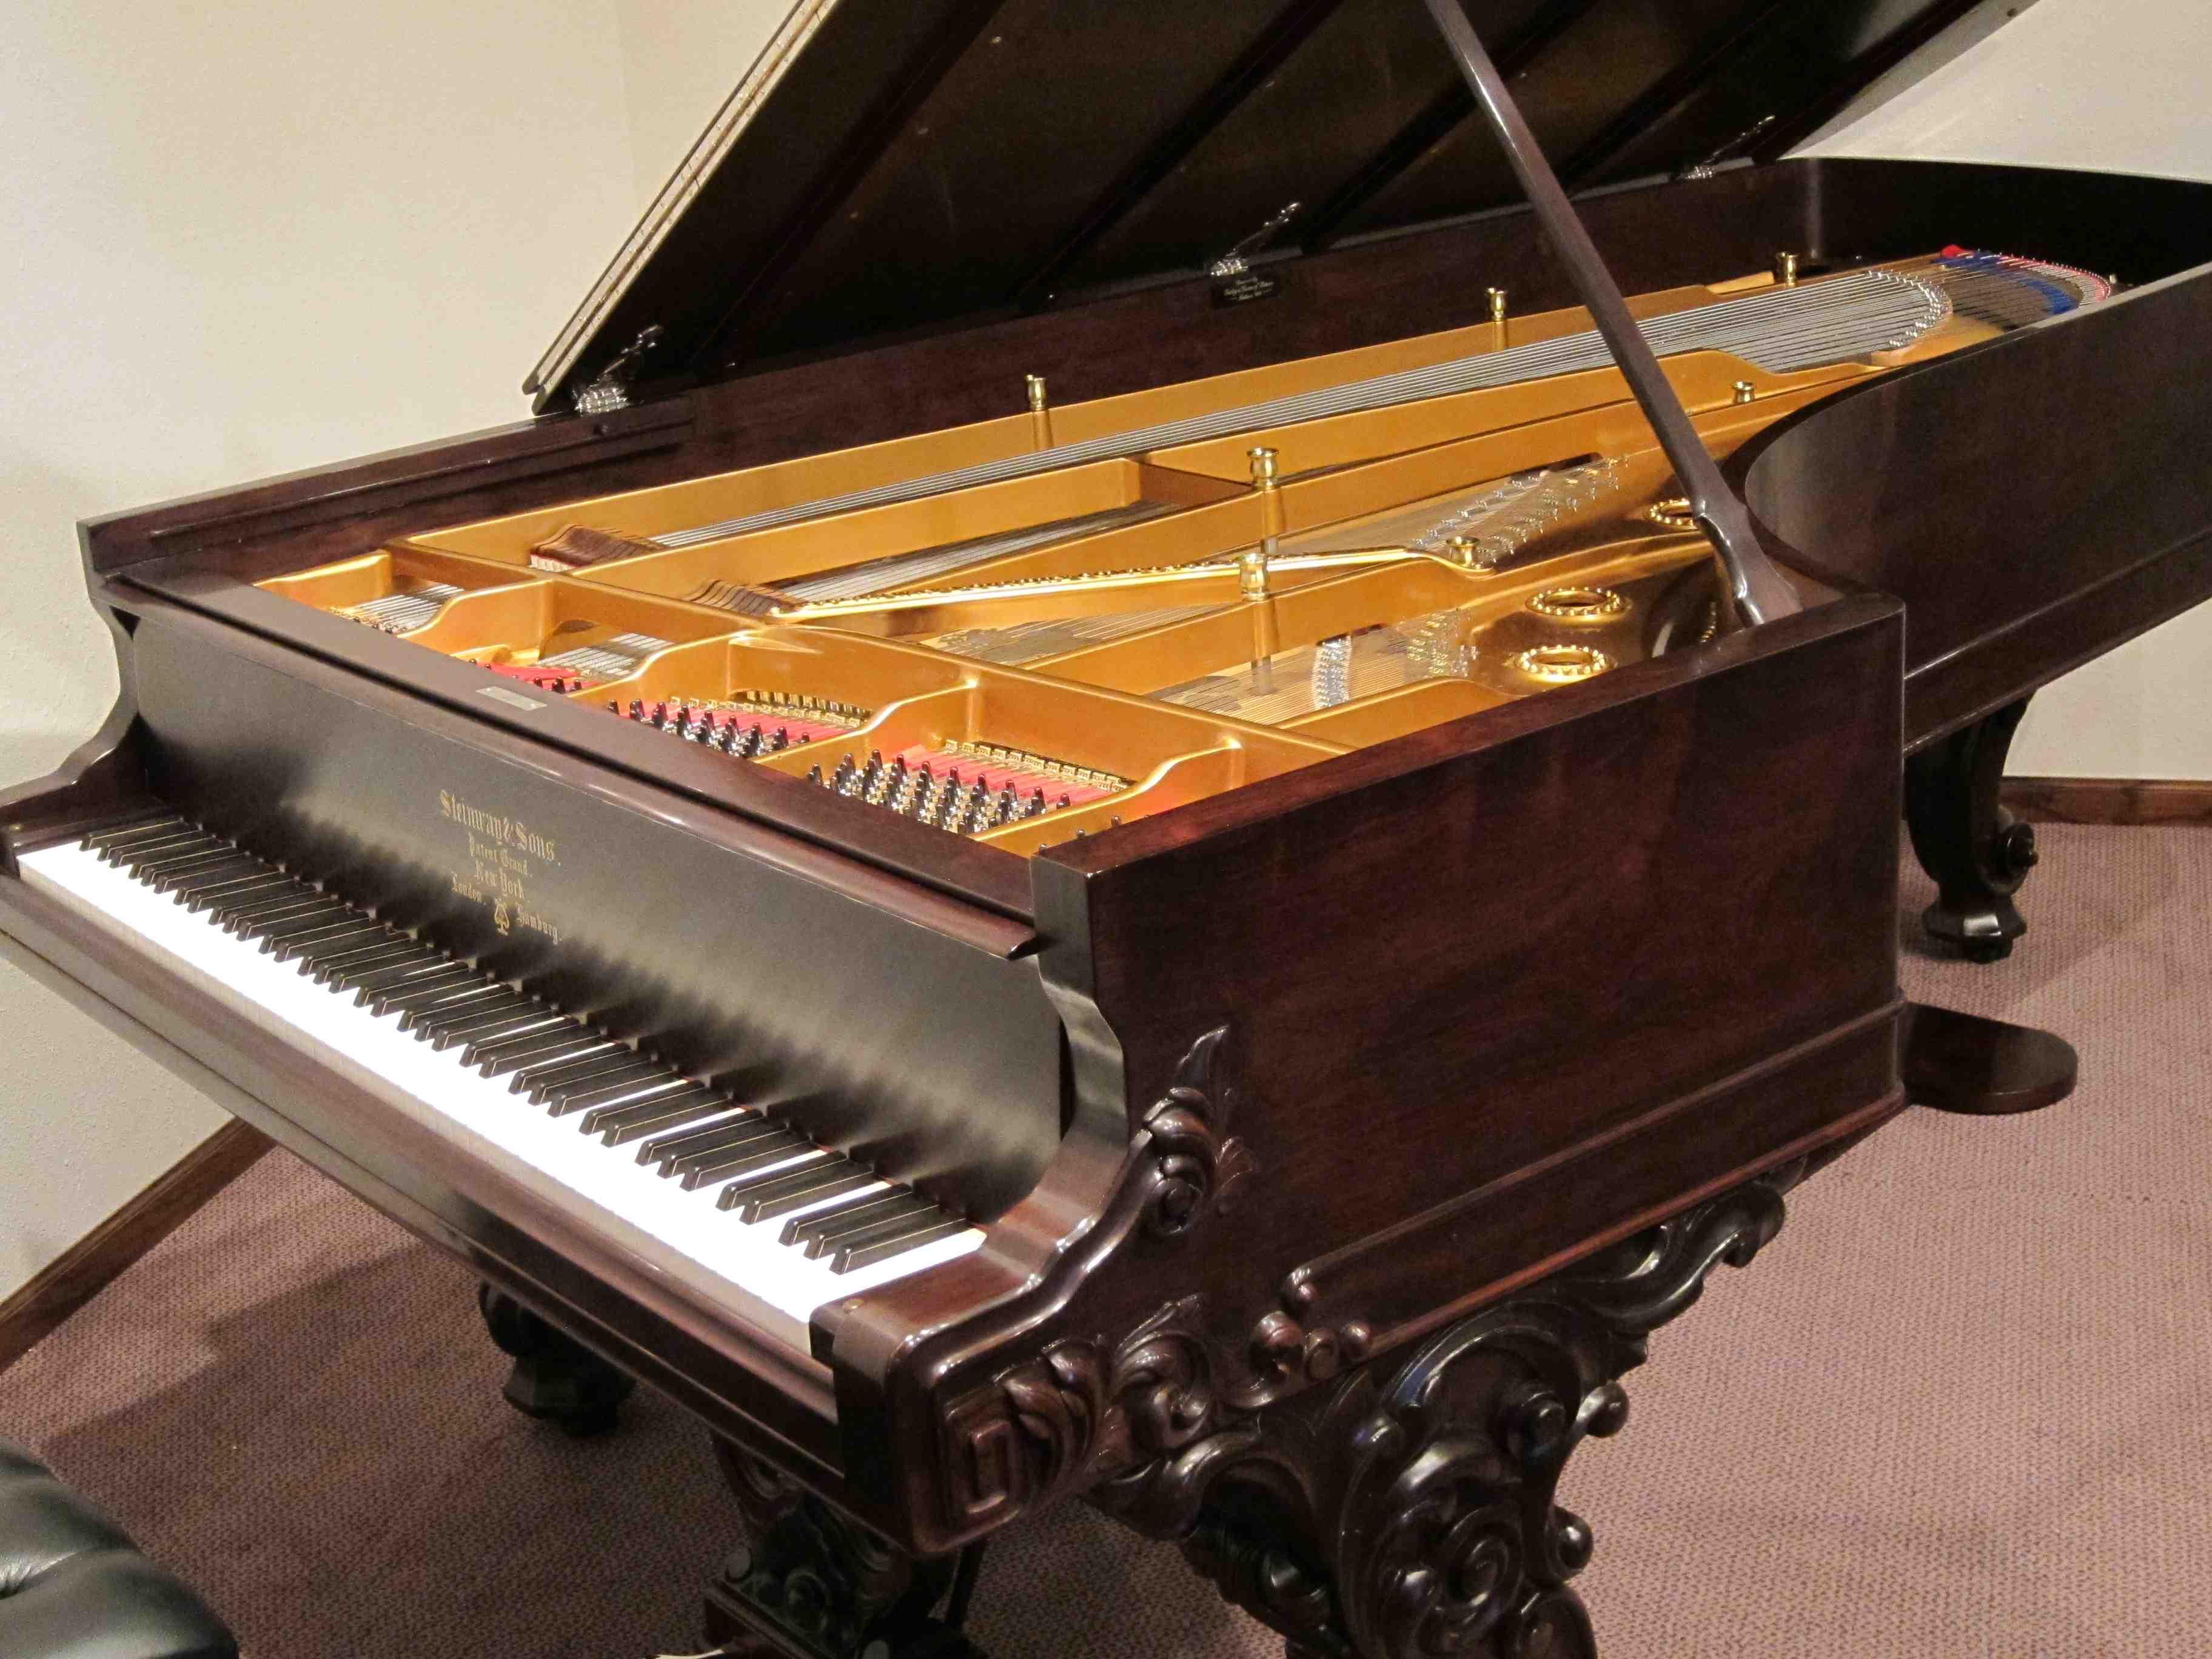 Farley 1877 piano